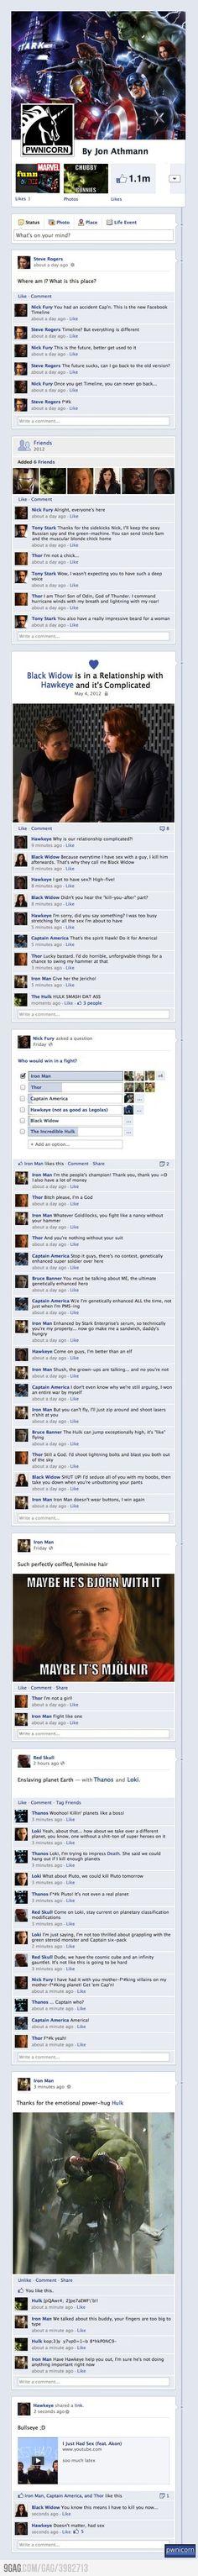 Hilarious...Avengers Facebook convo